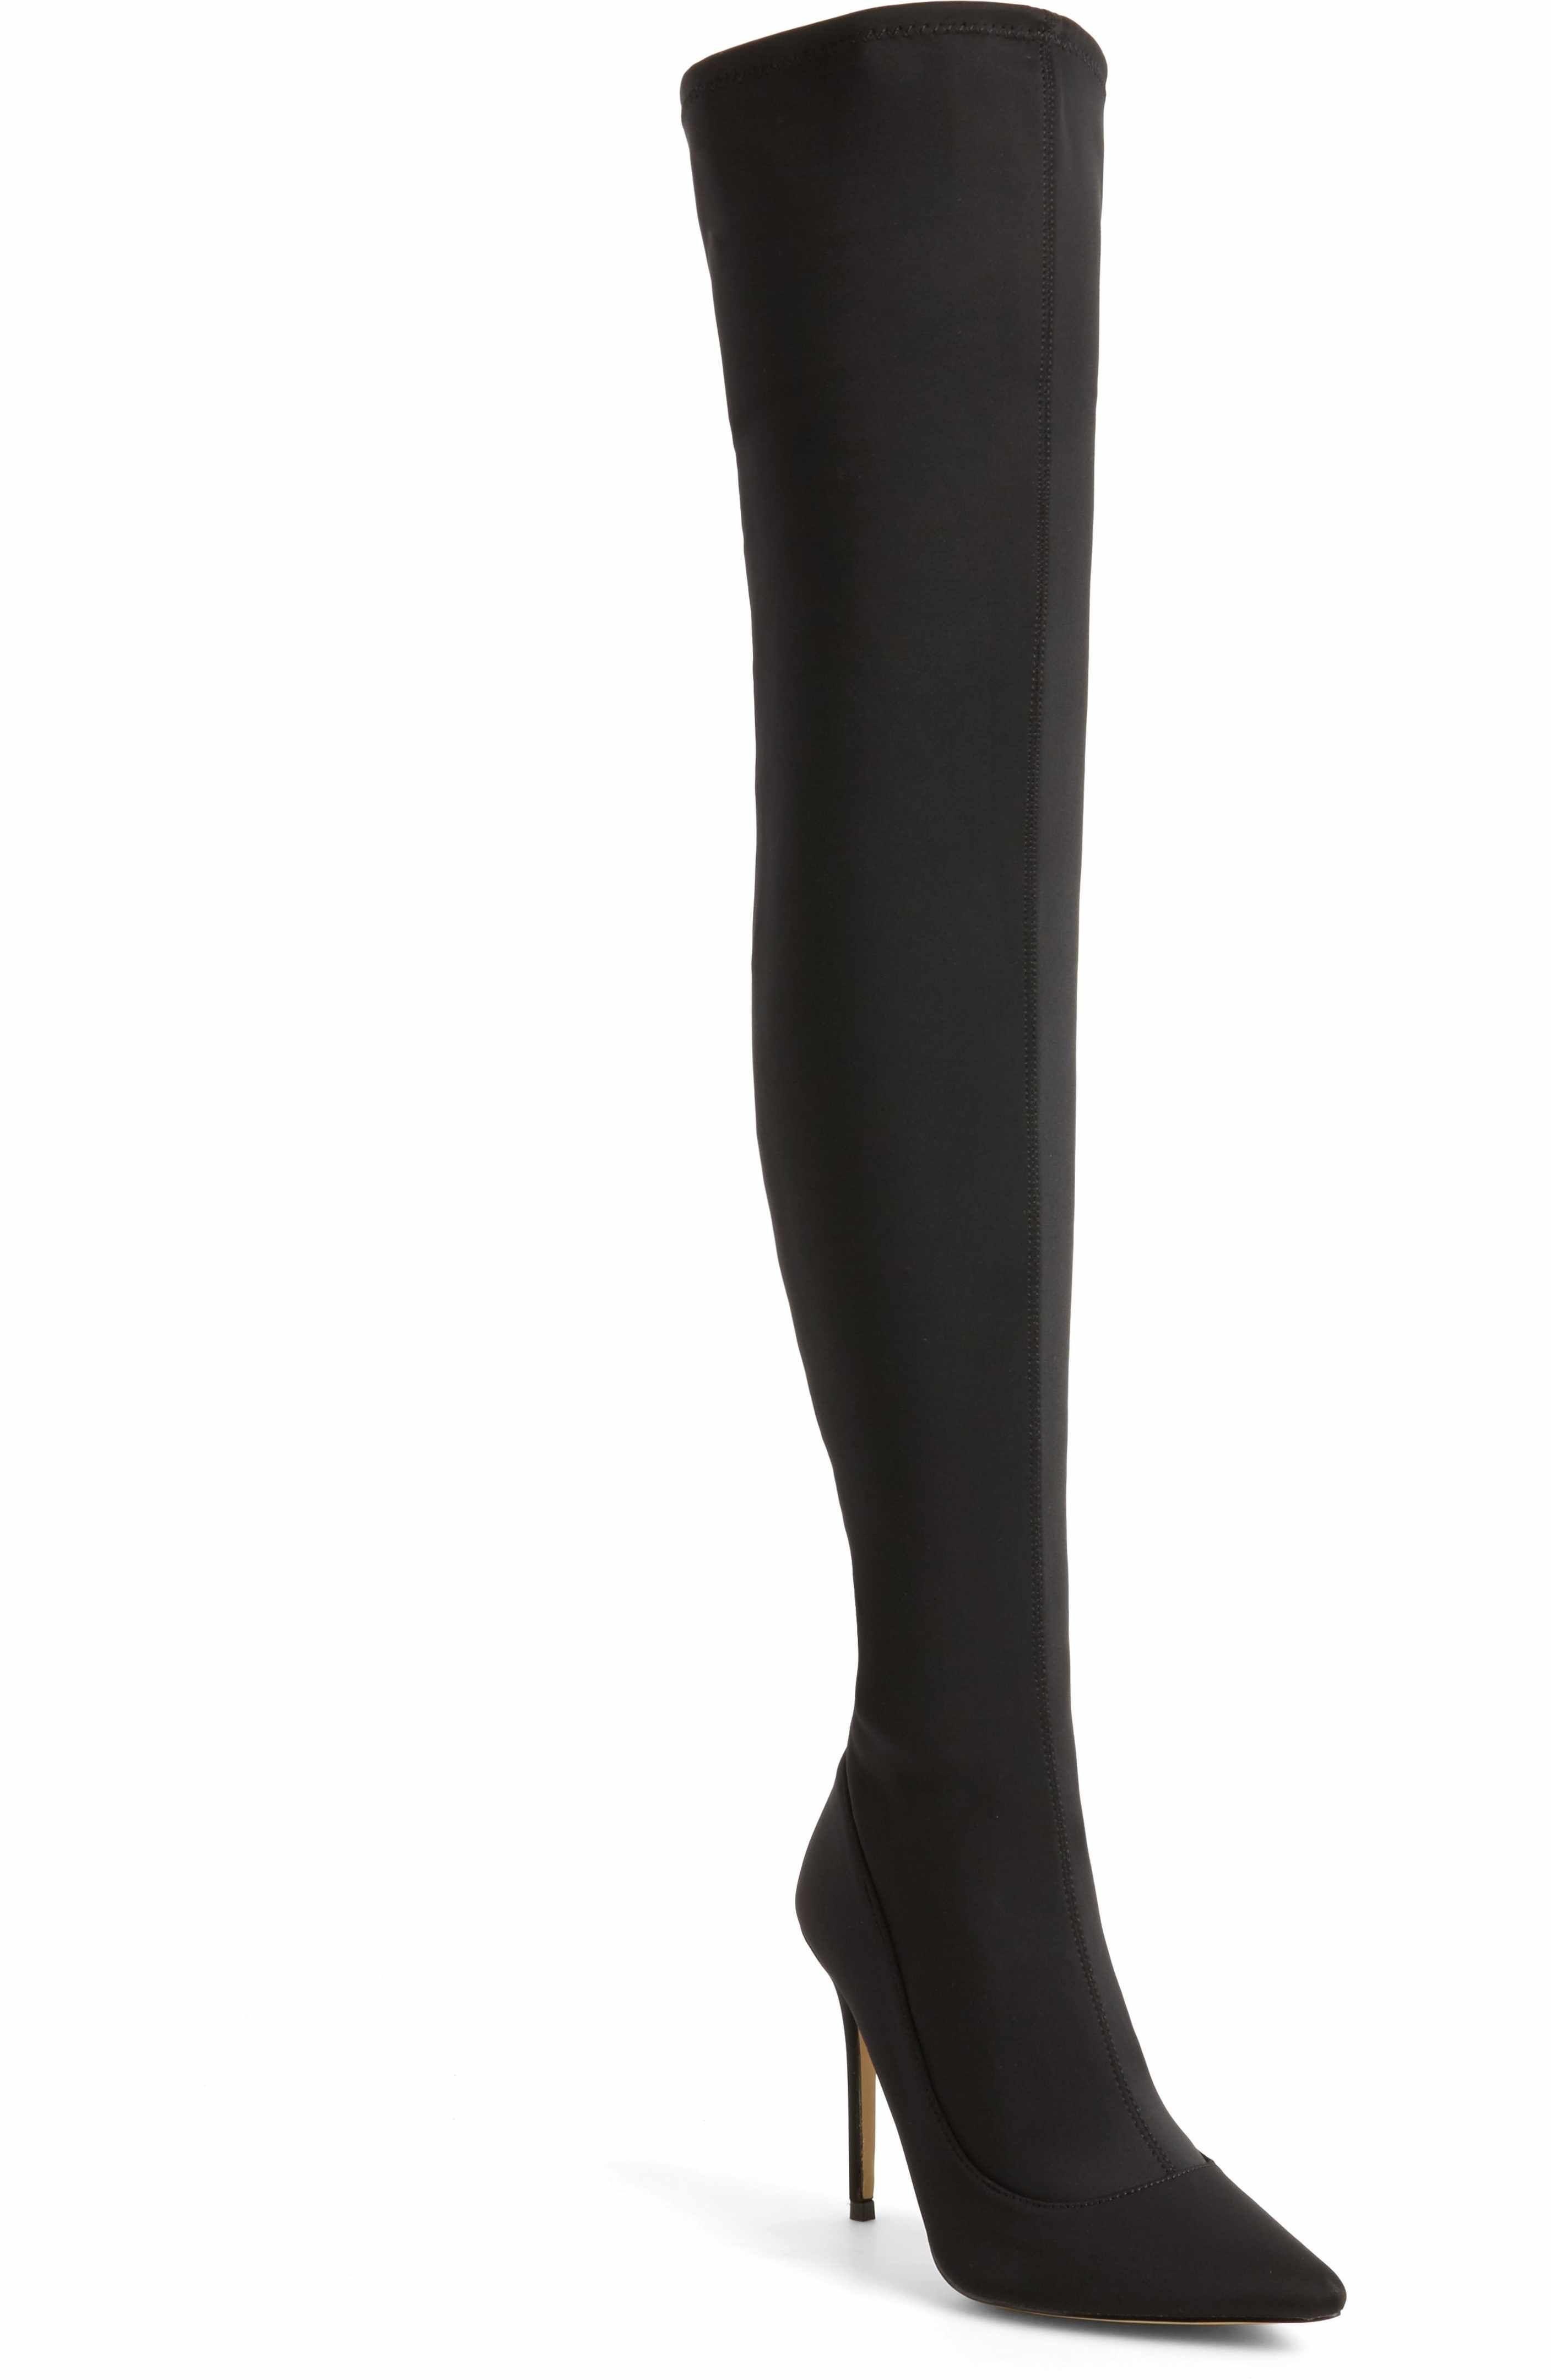 de08c315562 Main Image - Topshop Bellini Stiletto Over the Knee Boot (Women ...